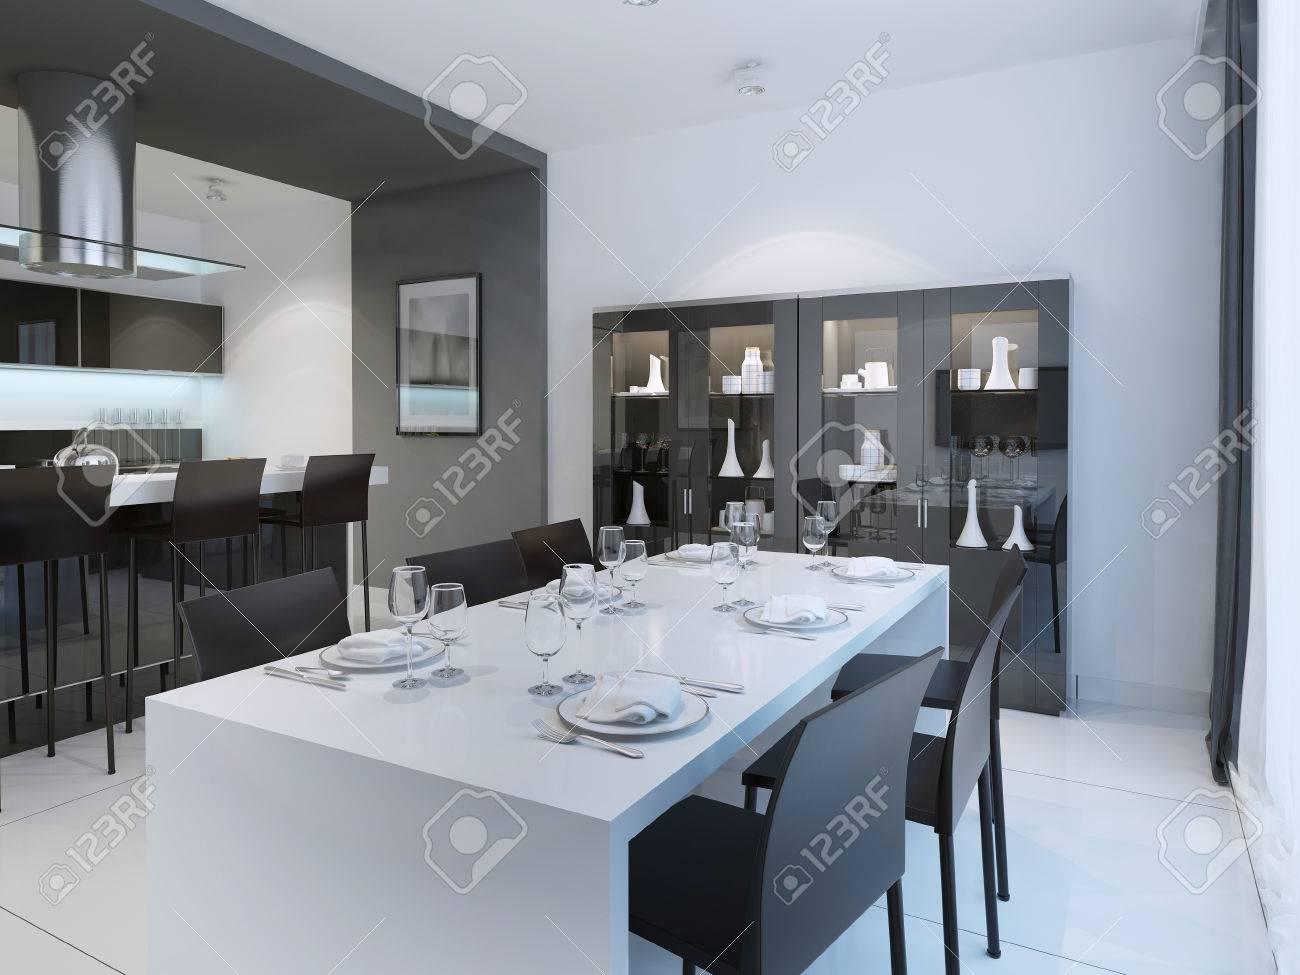 Comedor Contemporáneo Con Mesa Blanca Servido. 3D Rinden Fotos ...